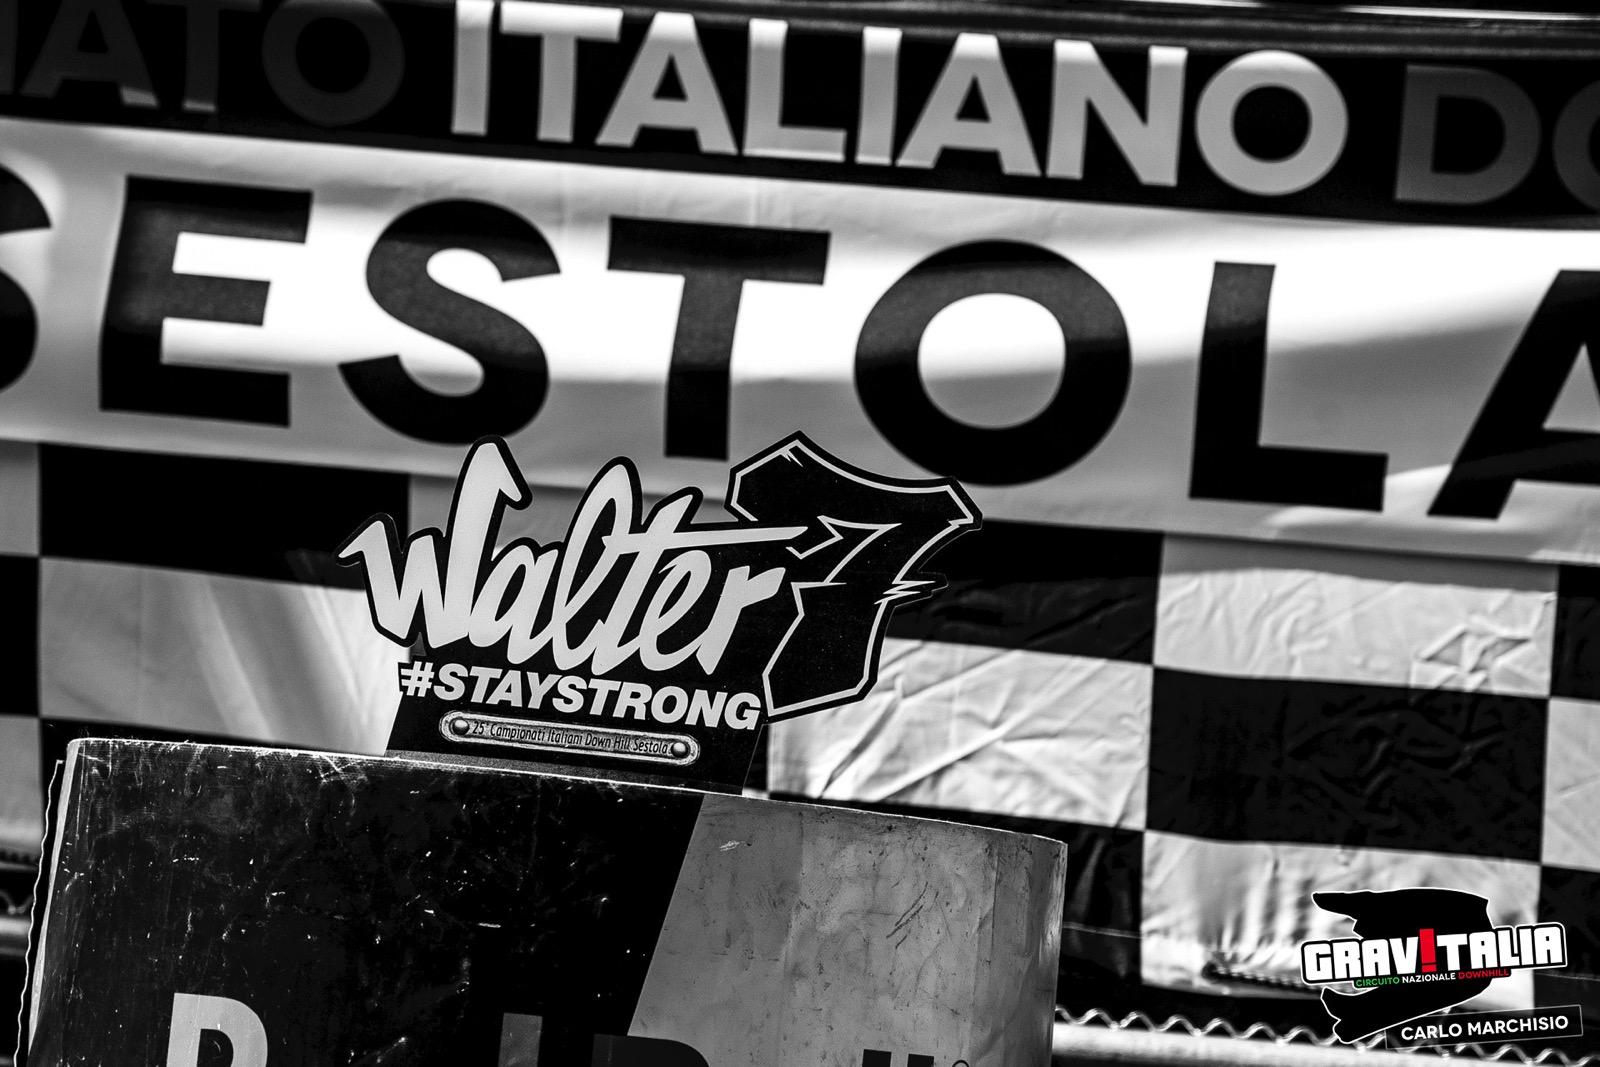 PhotoCarloMarchisio_GIT2015_CampionatiItaliani_Sestola_111